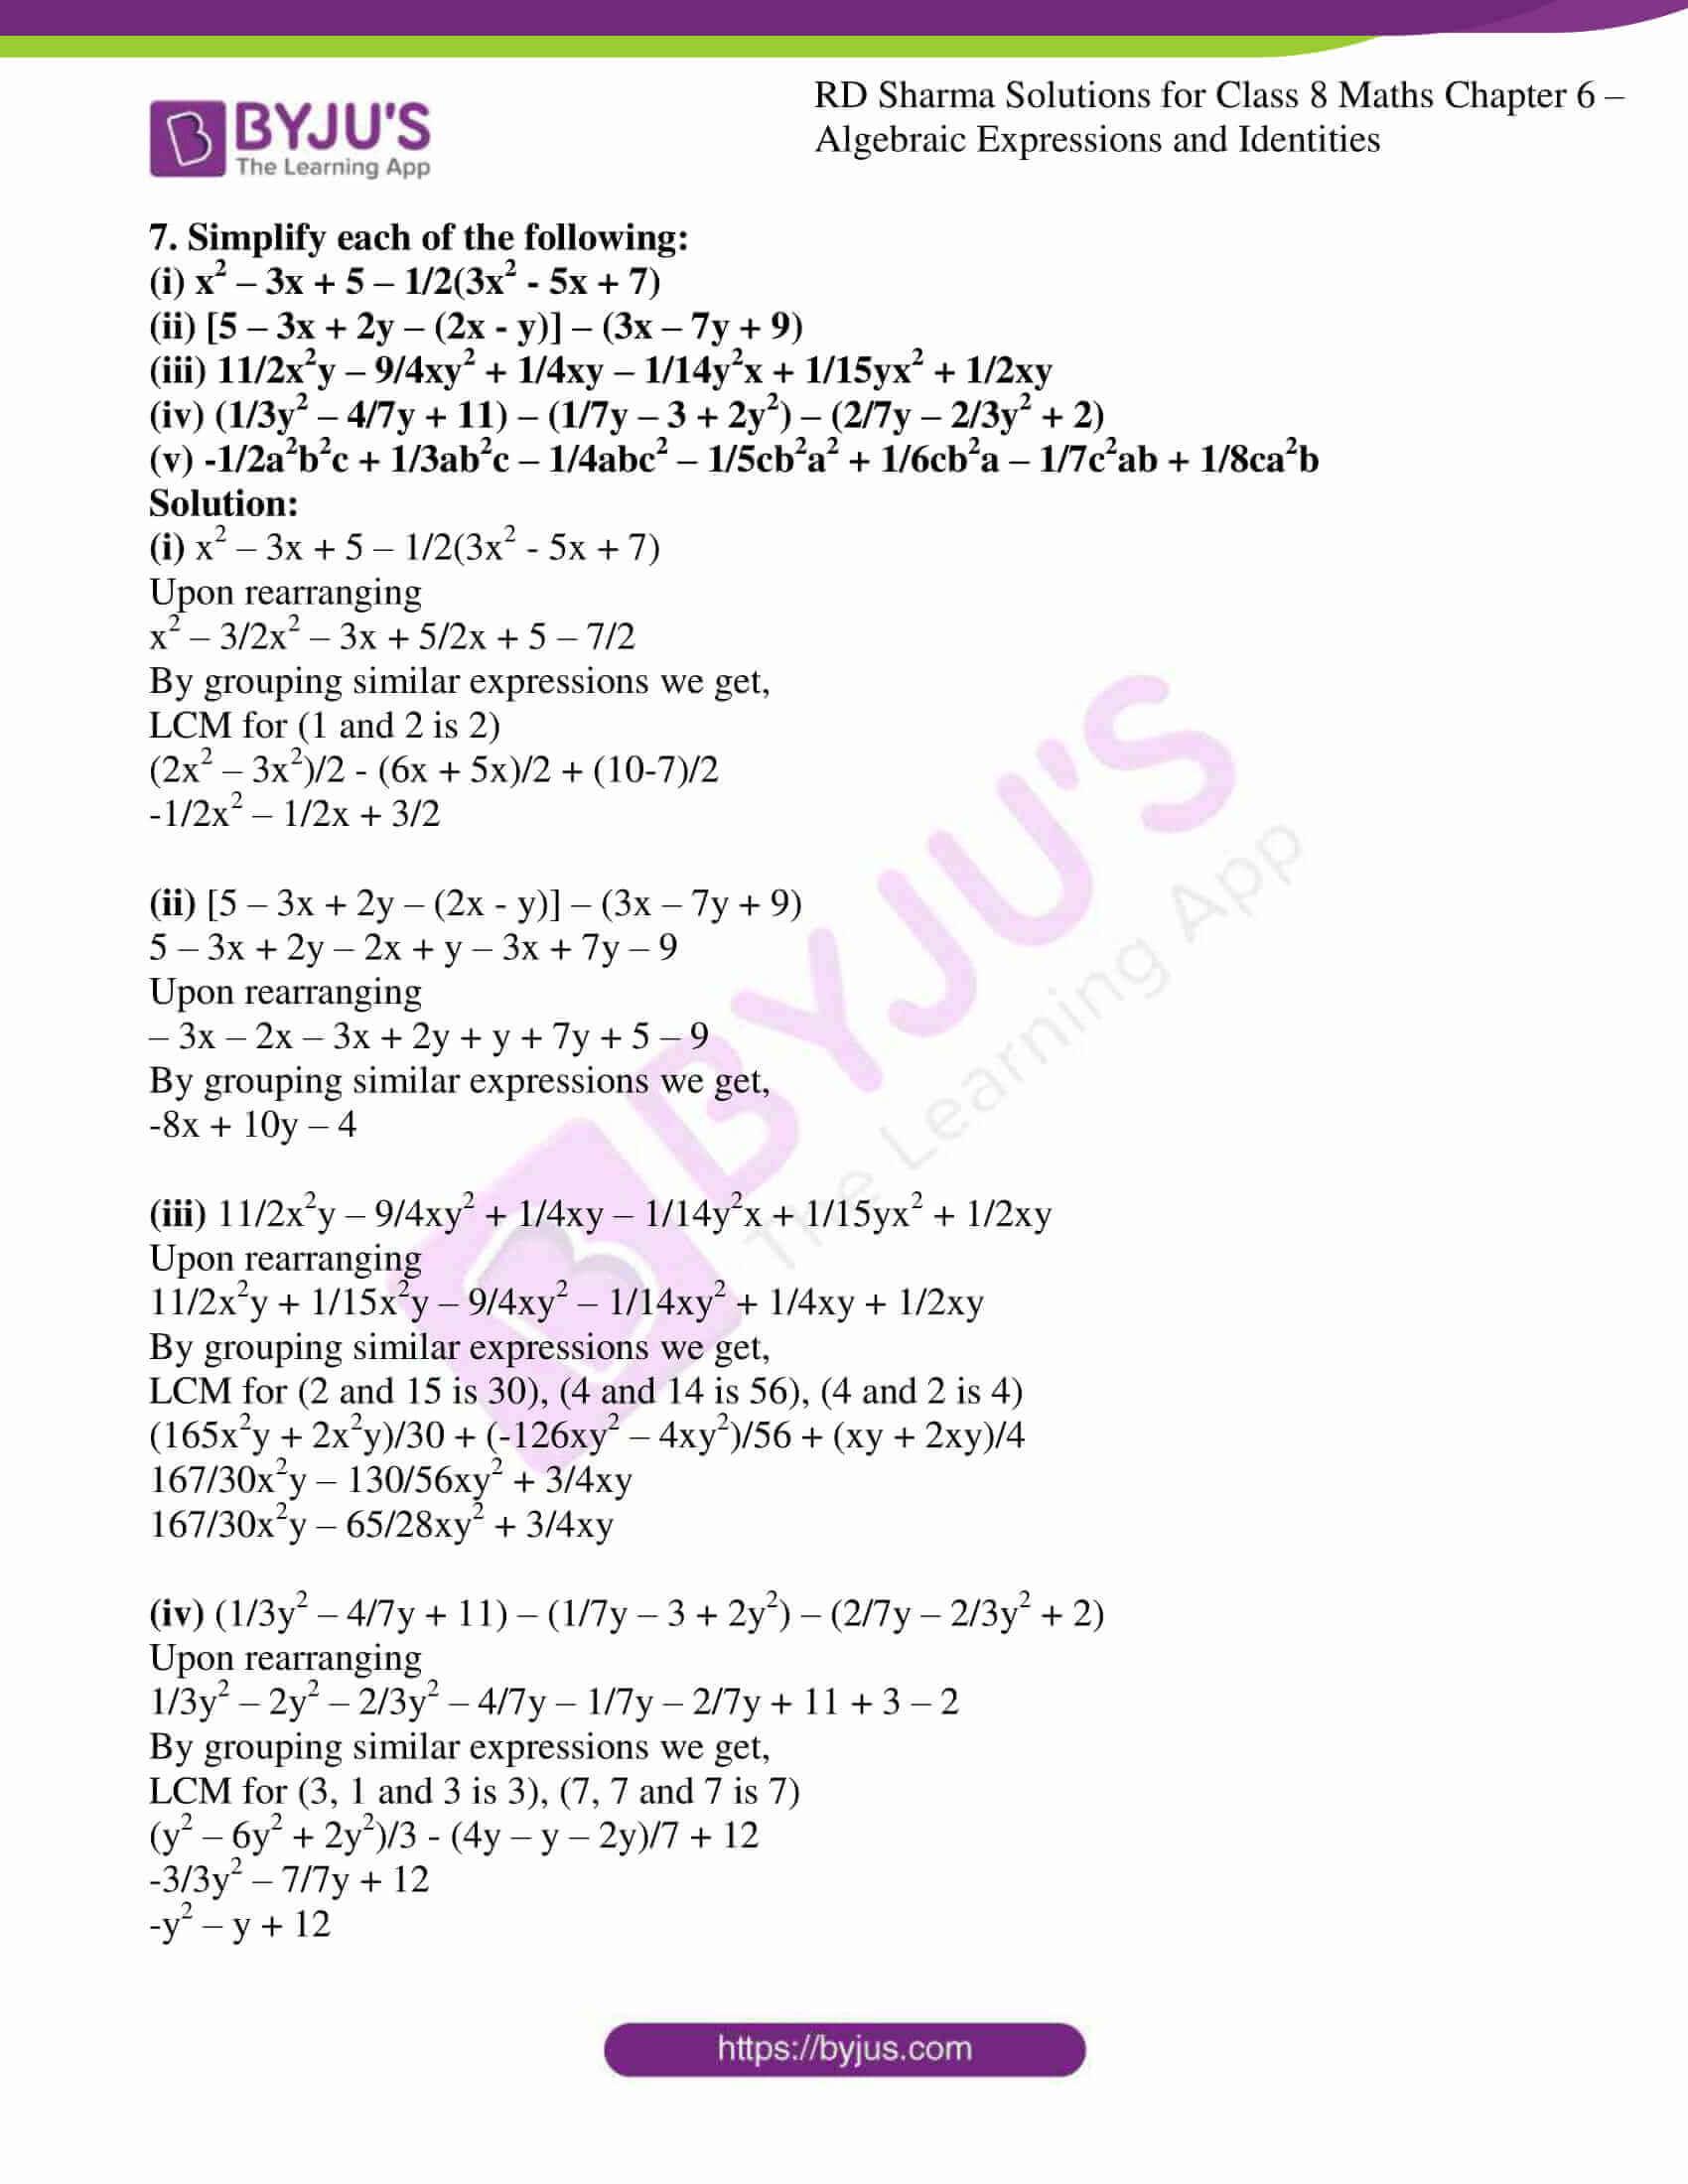 rd sharma class 8 maths chapter 6 exercise 2 7